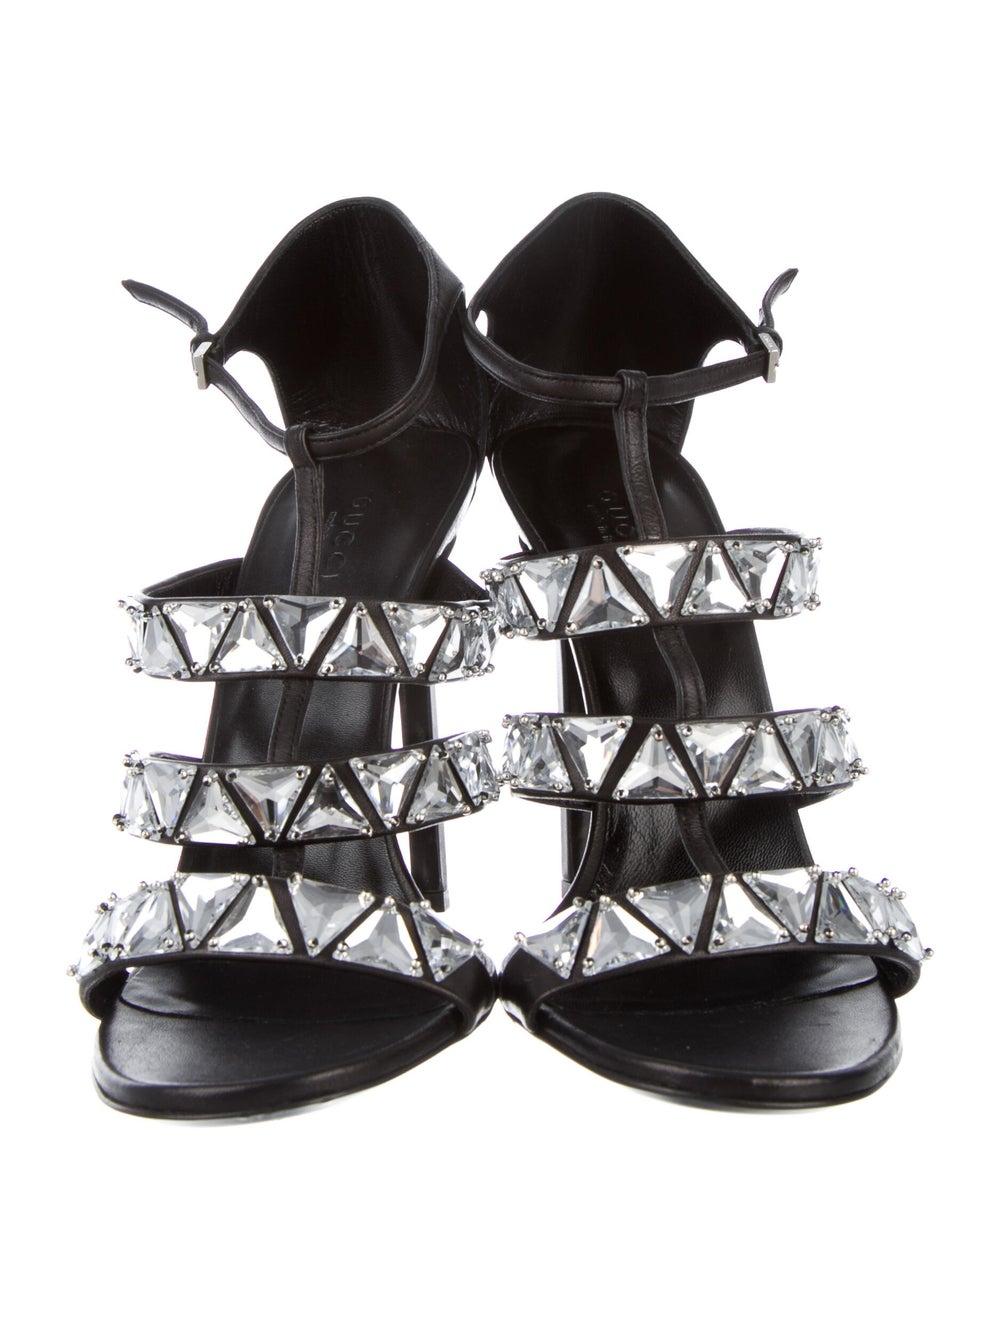 Gucci Leather Crystal Embellishments Sandals Black - image 3